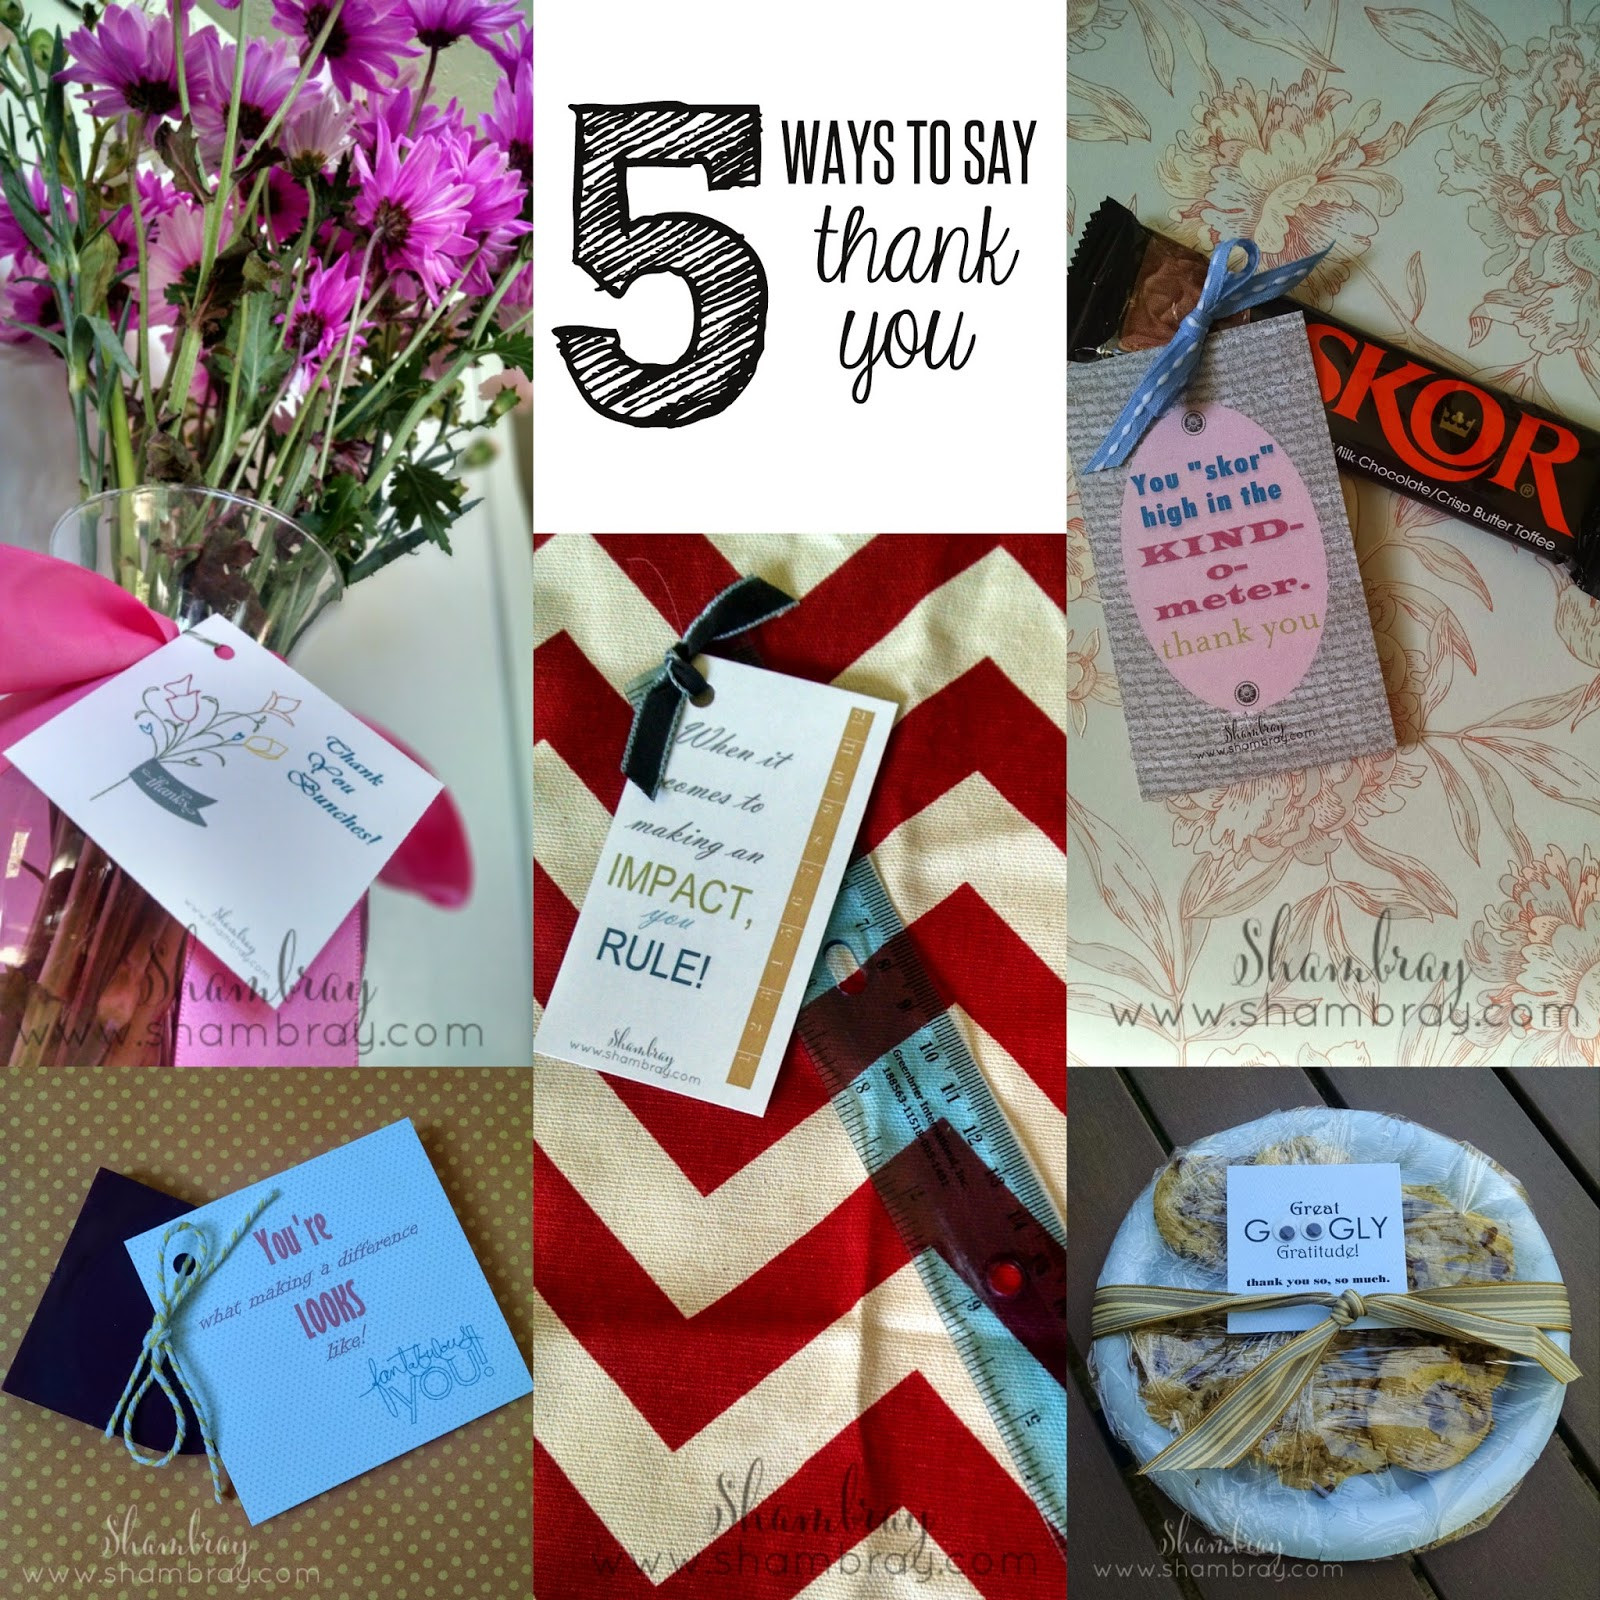 Gift Ideas To Say Thank You  Shambray Creative ways to say thank you and t ideas